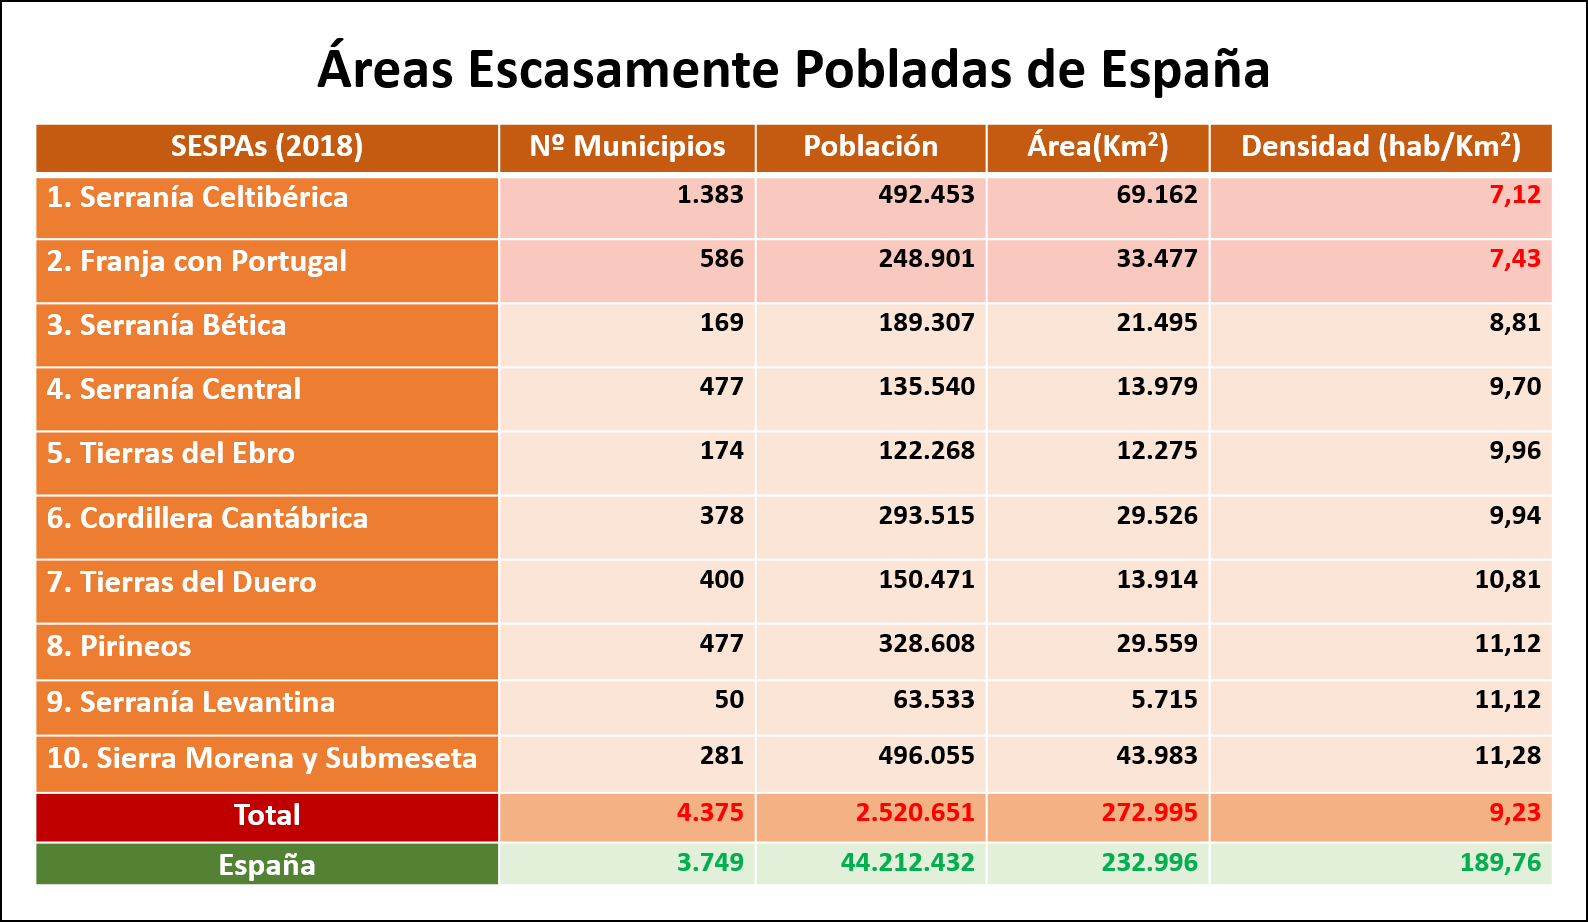 Gráficas Áreas Escasamente Pobladas - Pilar Burillo - Asociación Española contra la Despoblación - TiétarTeVe